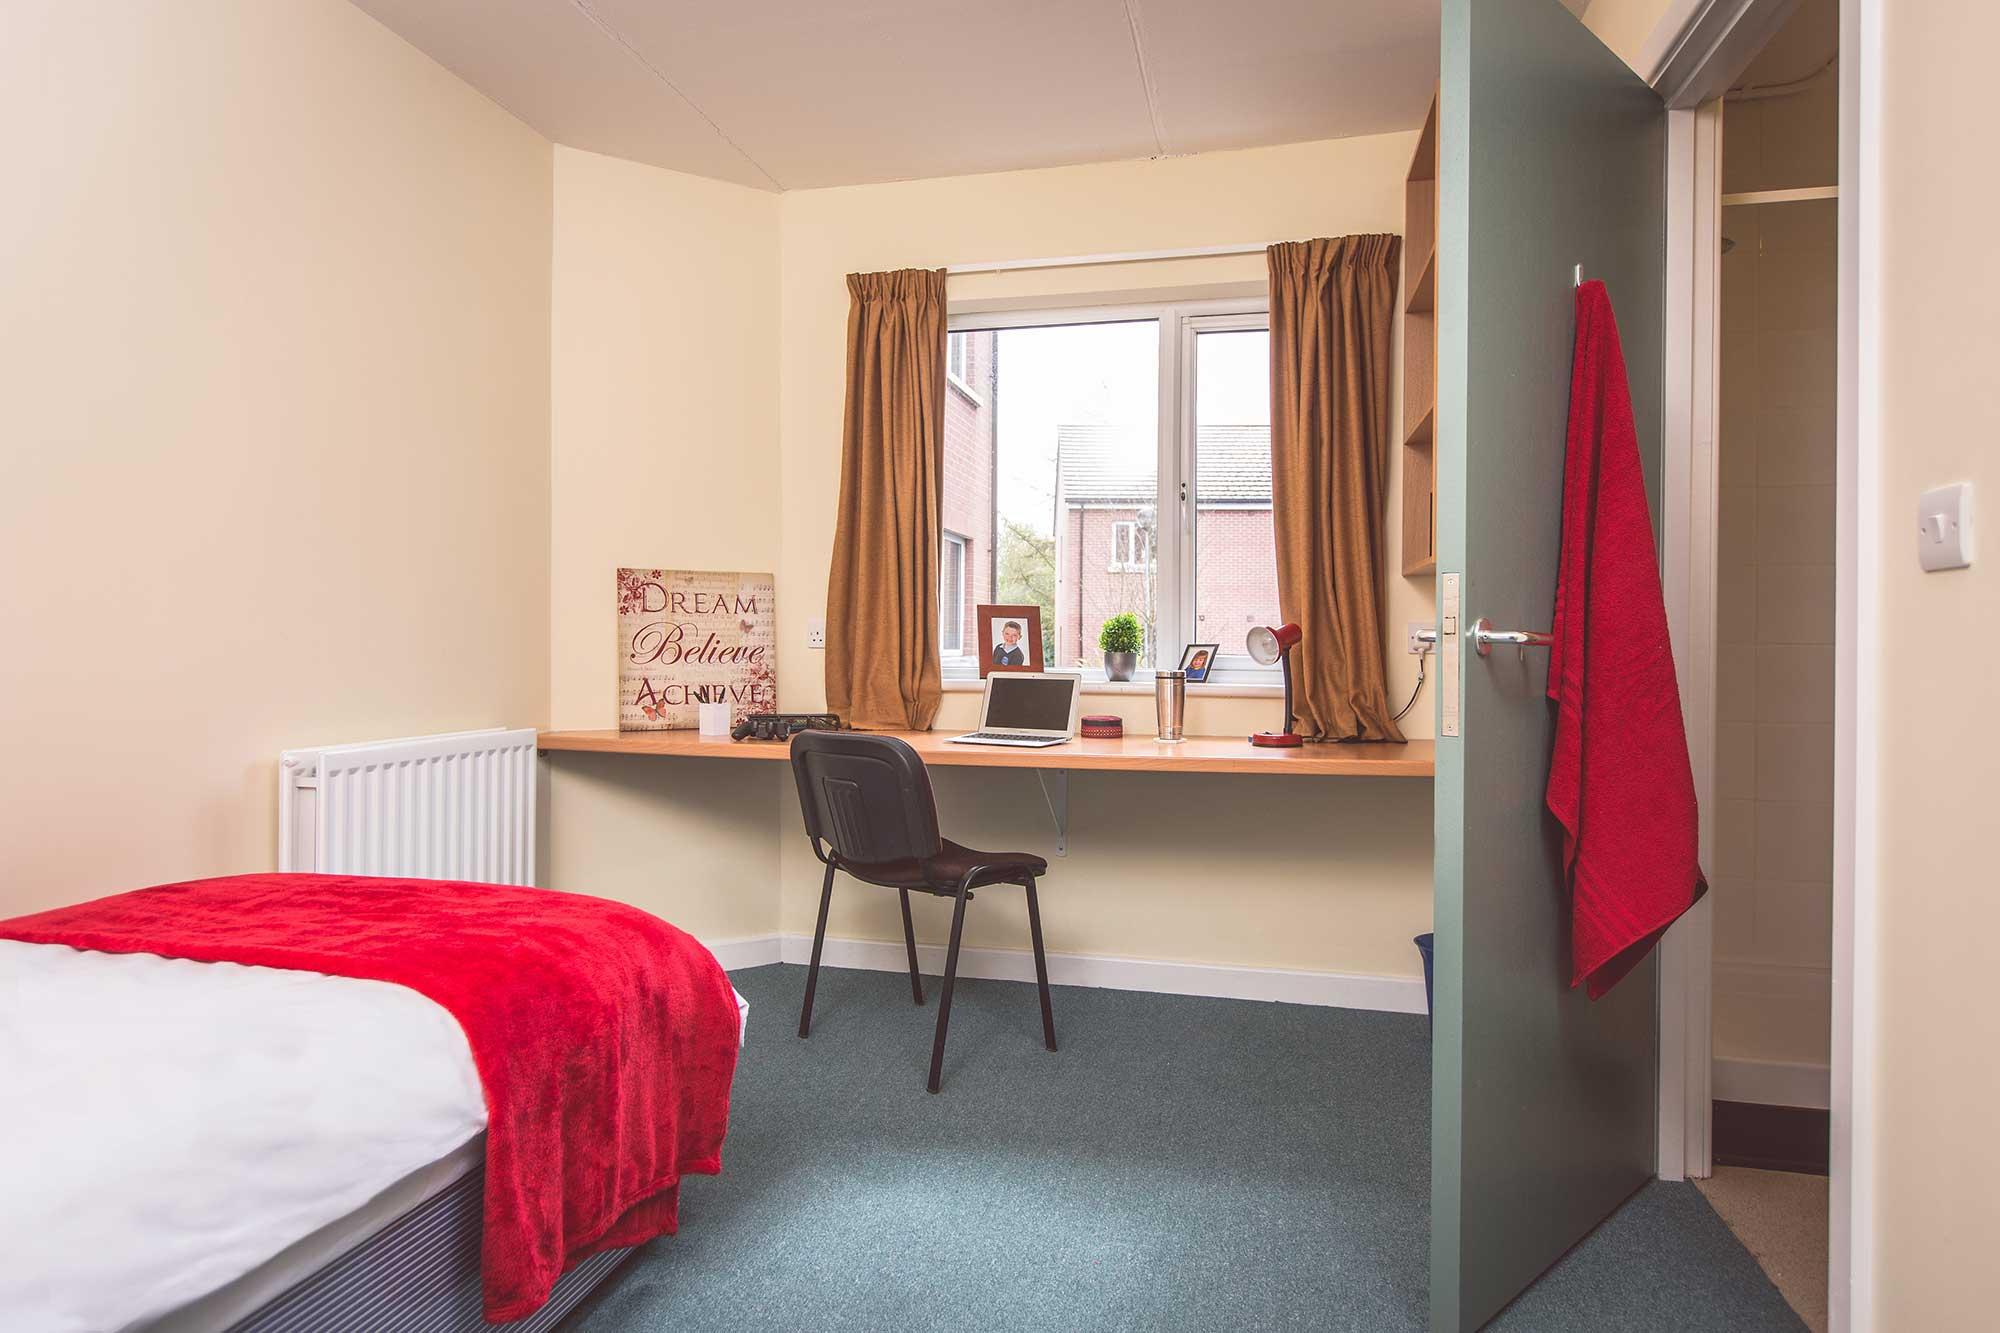 It Room: Dalriada Village Accommodation